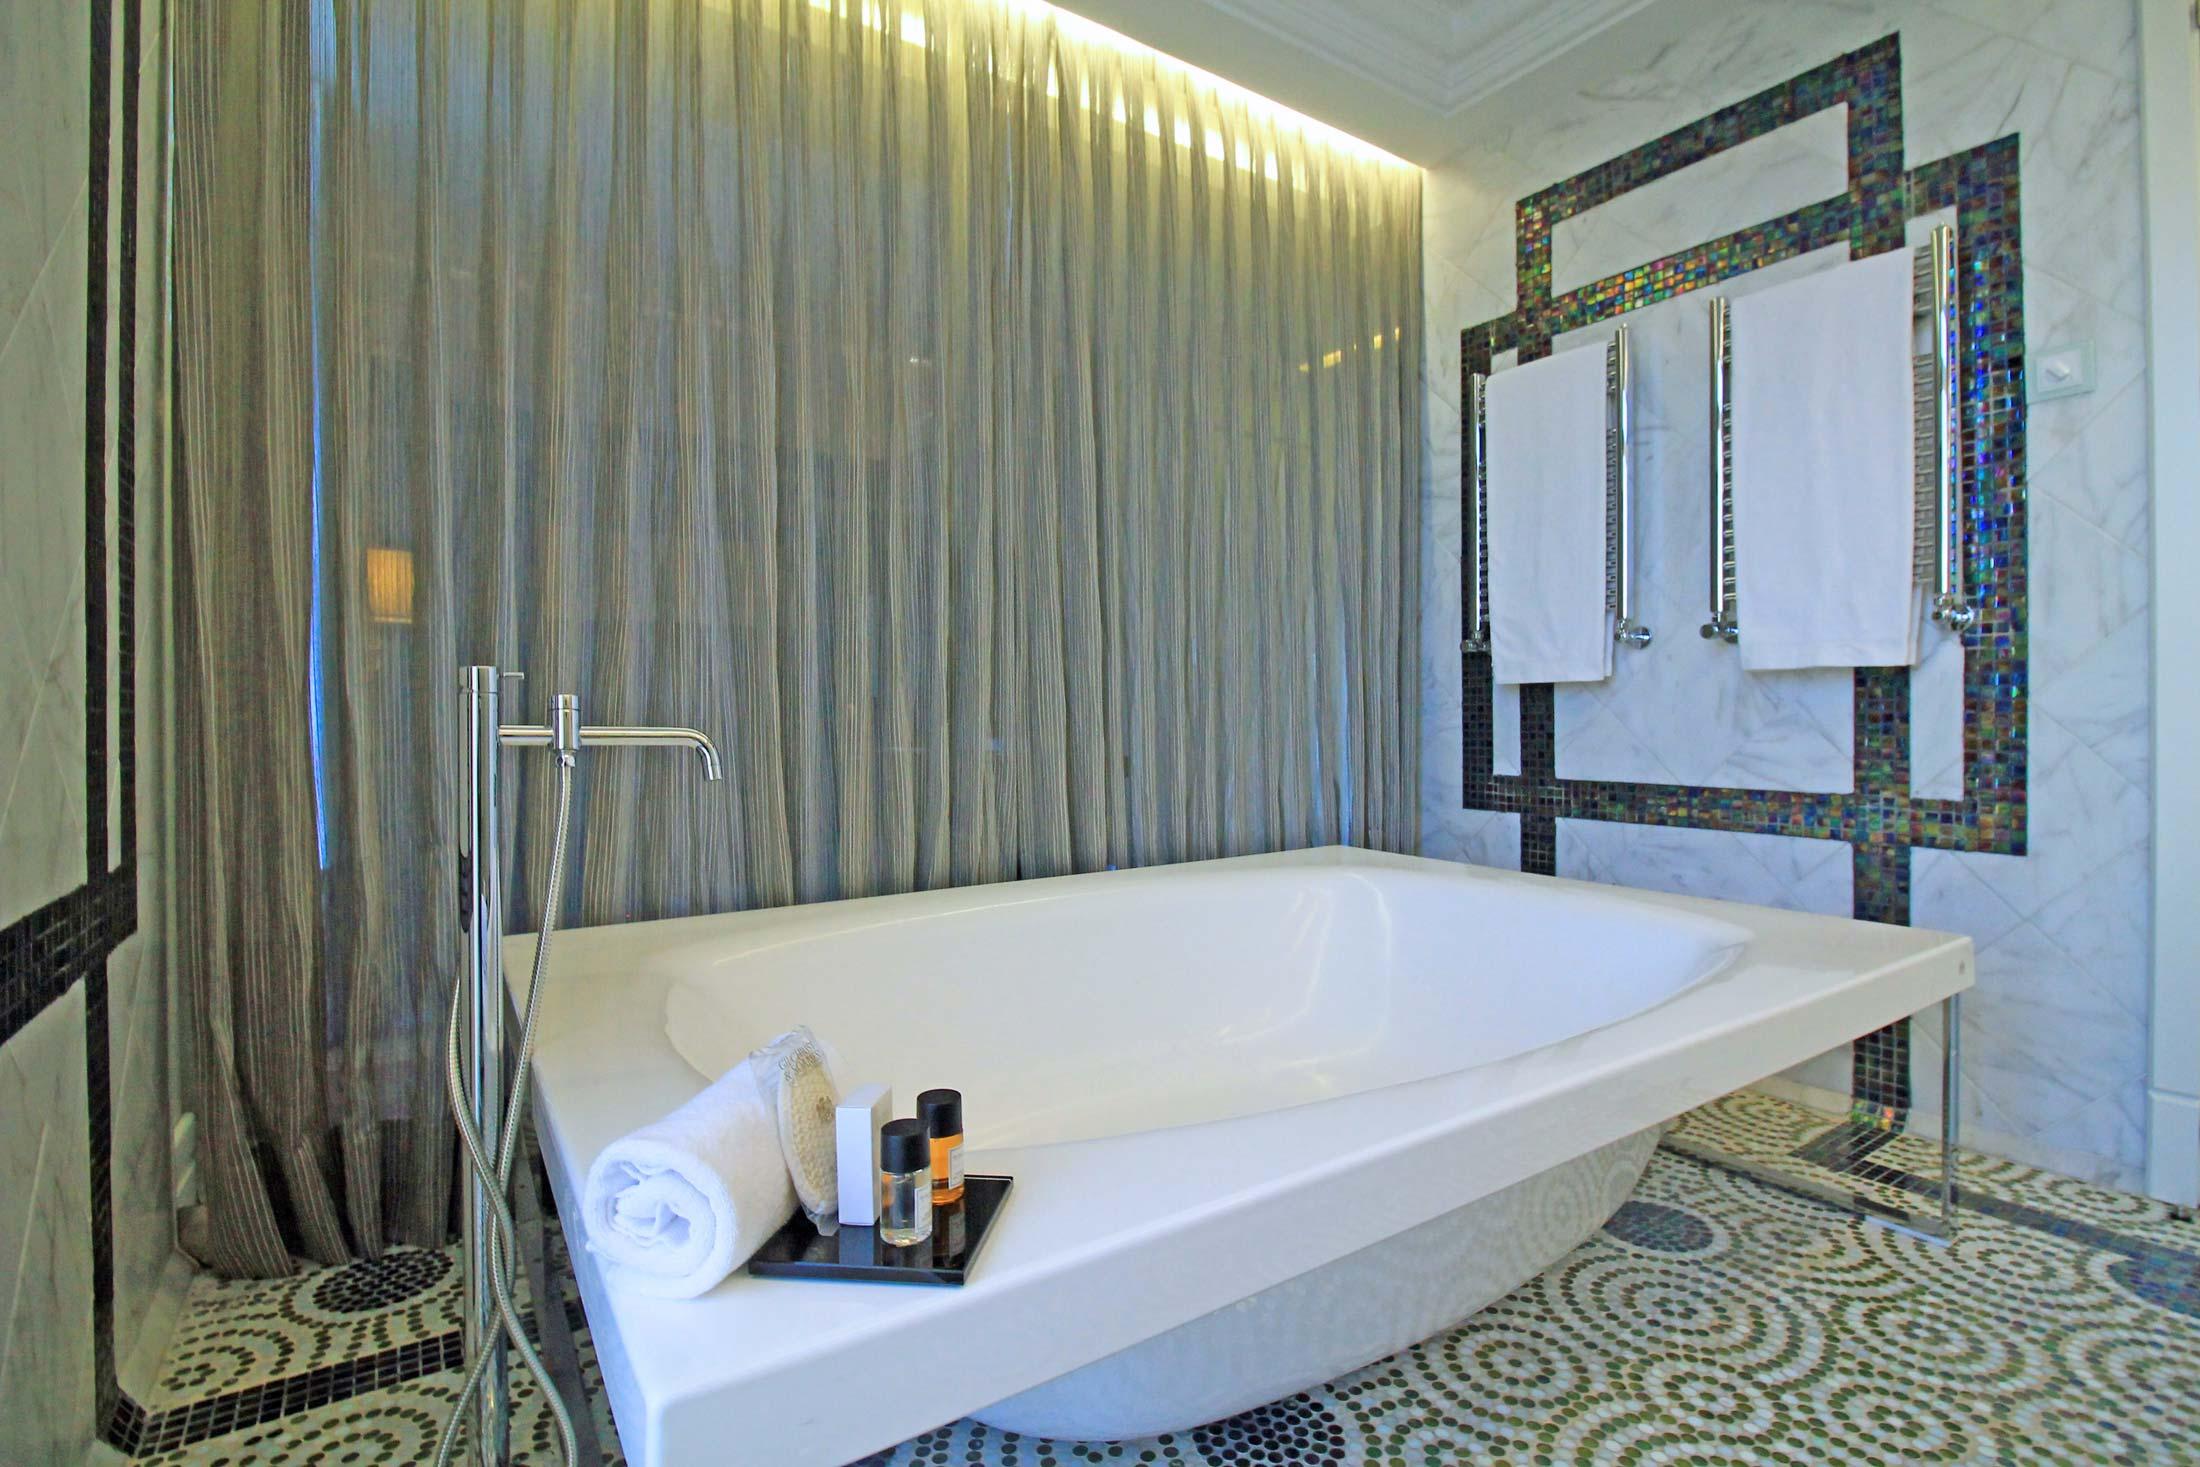 Unico Hotel Madrid - Focal Journey (by Gustavo Espinola)